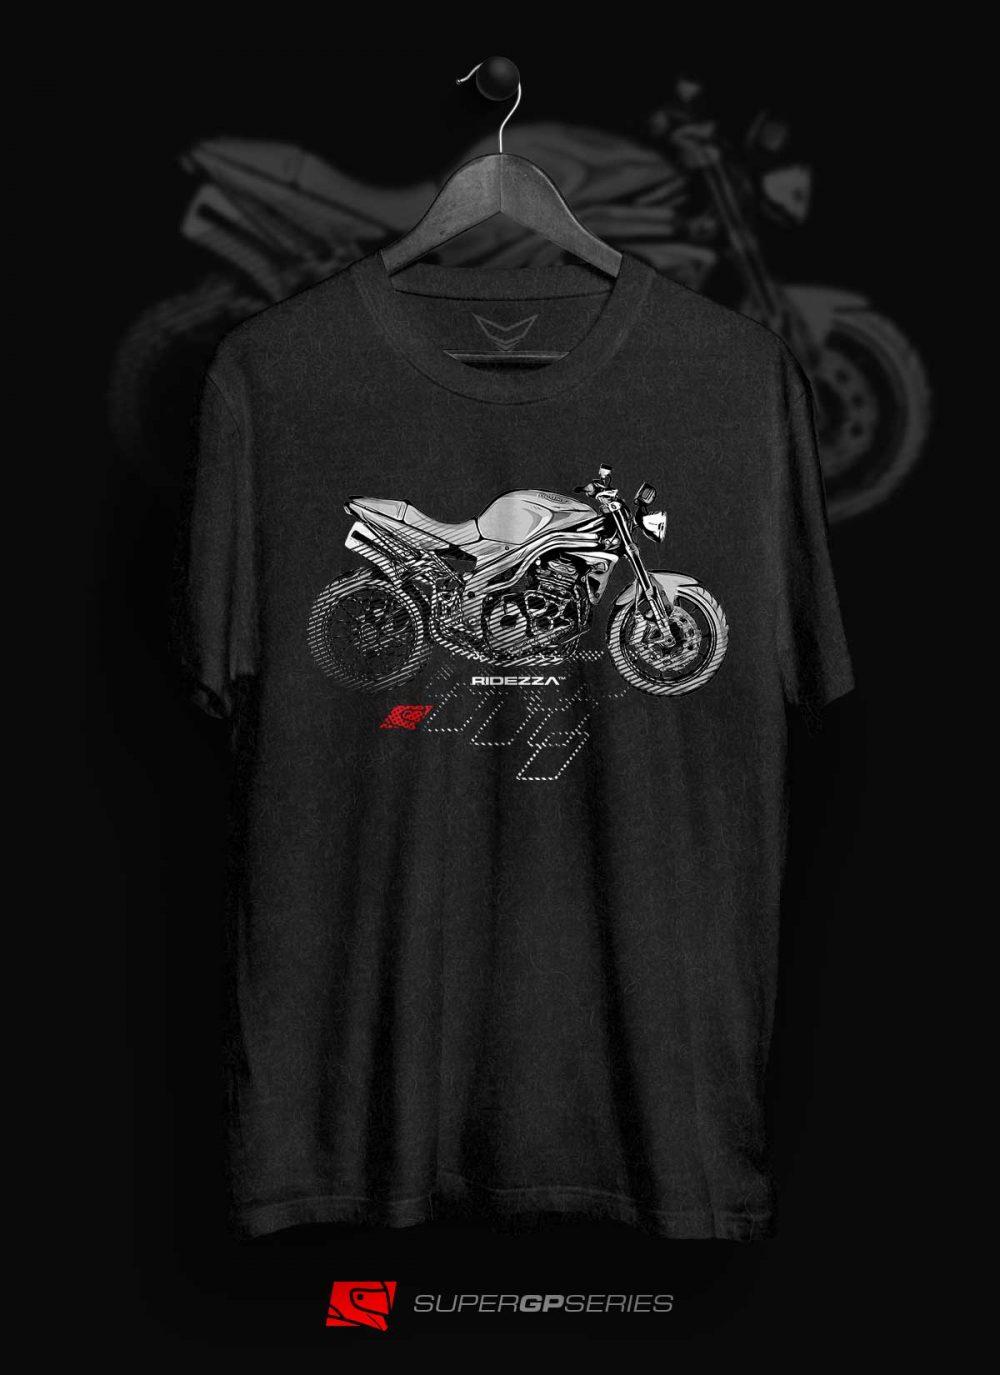 Ridezza Speed Triple 1050 SuperGP Series T-Shirt